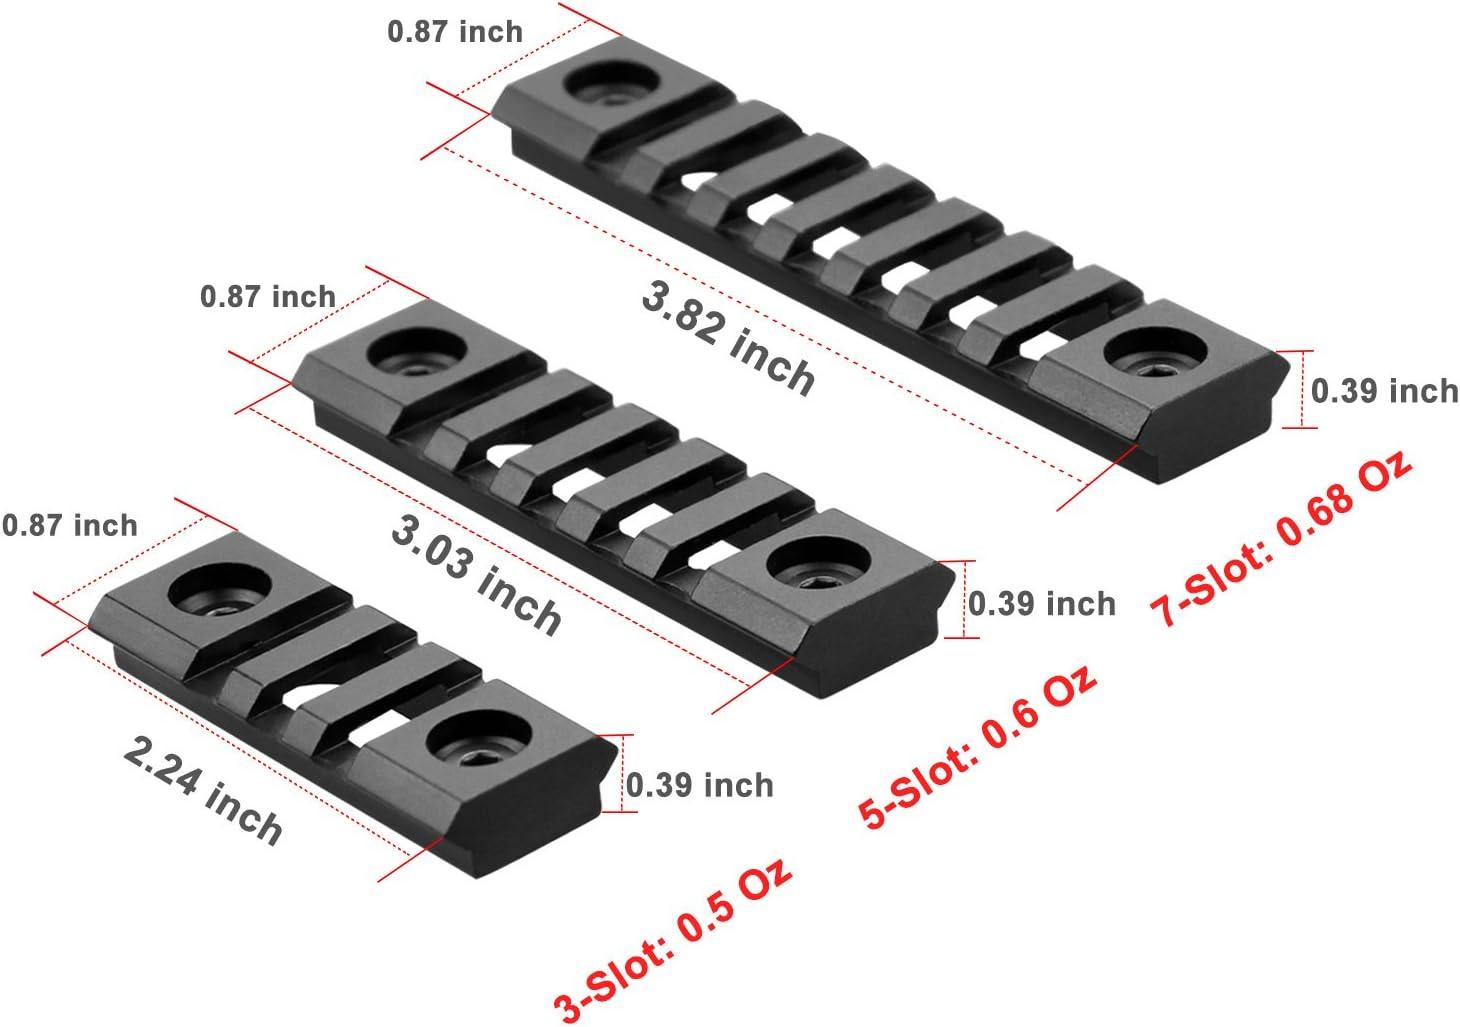 5 Slot 2 Keymod Rail Section Picatinny Rail for Key Mod Handguard Mount Rail System